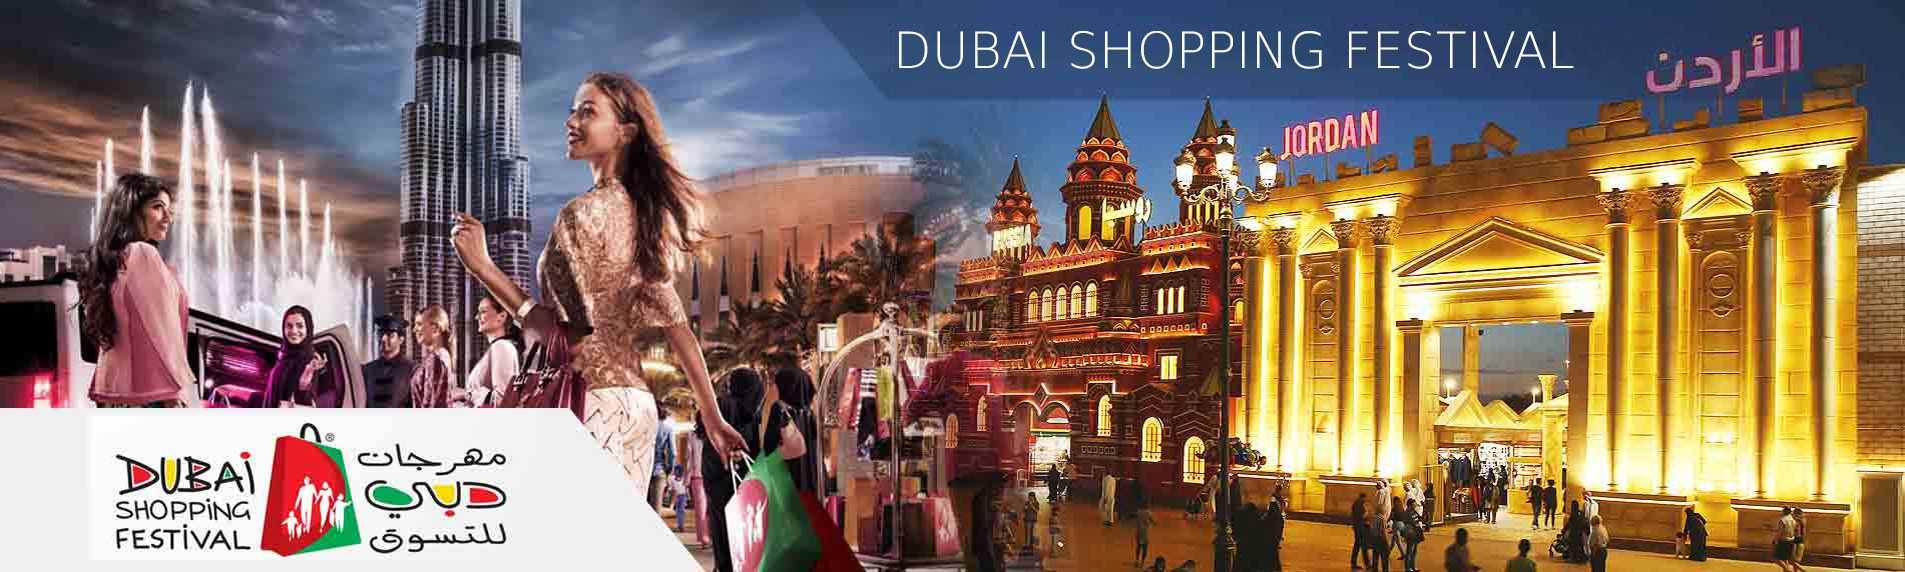 The Grand Dubai Shopping Festival